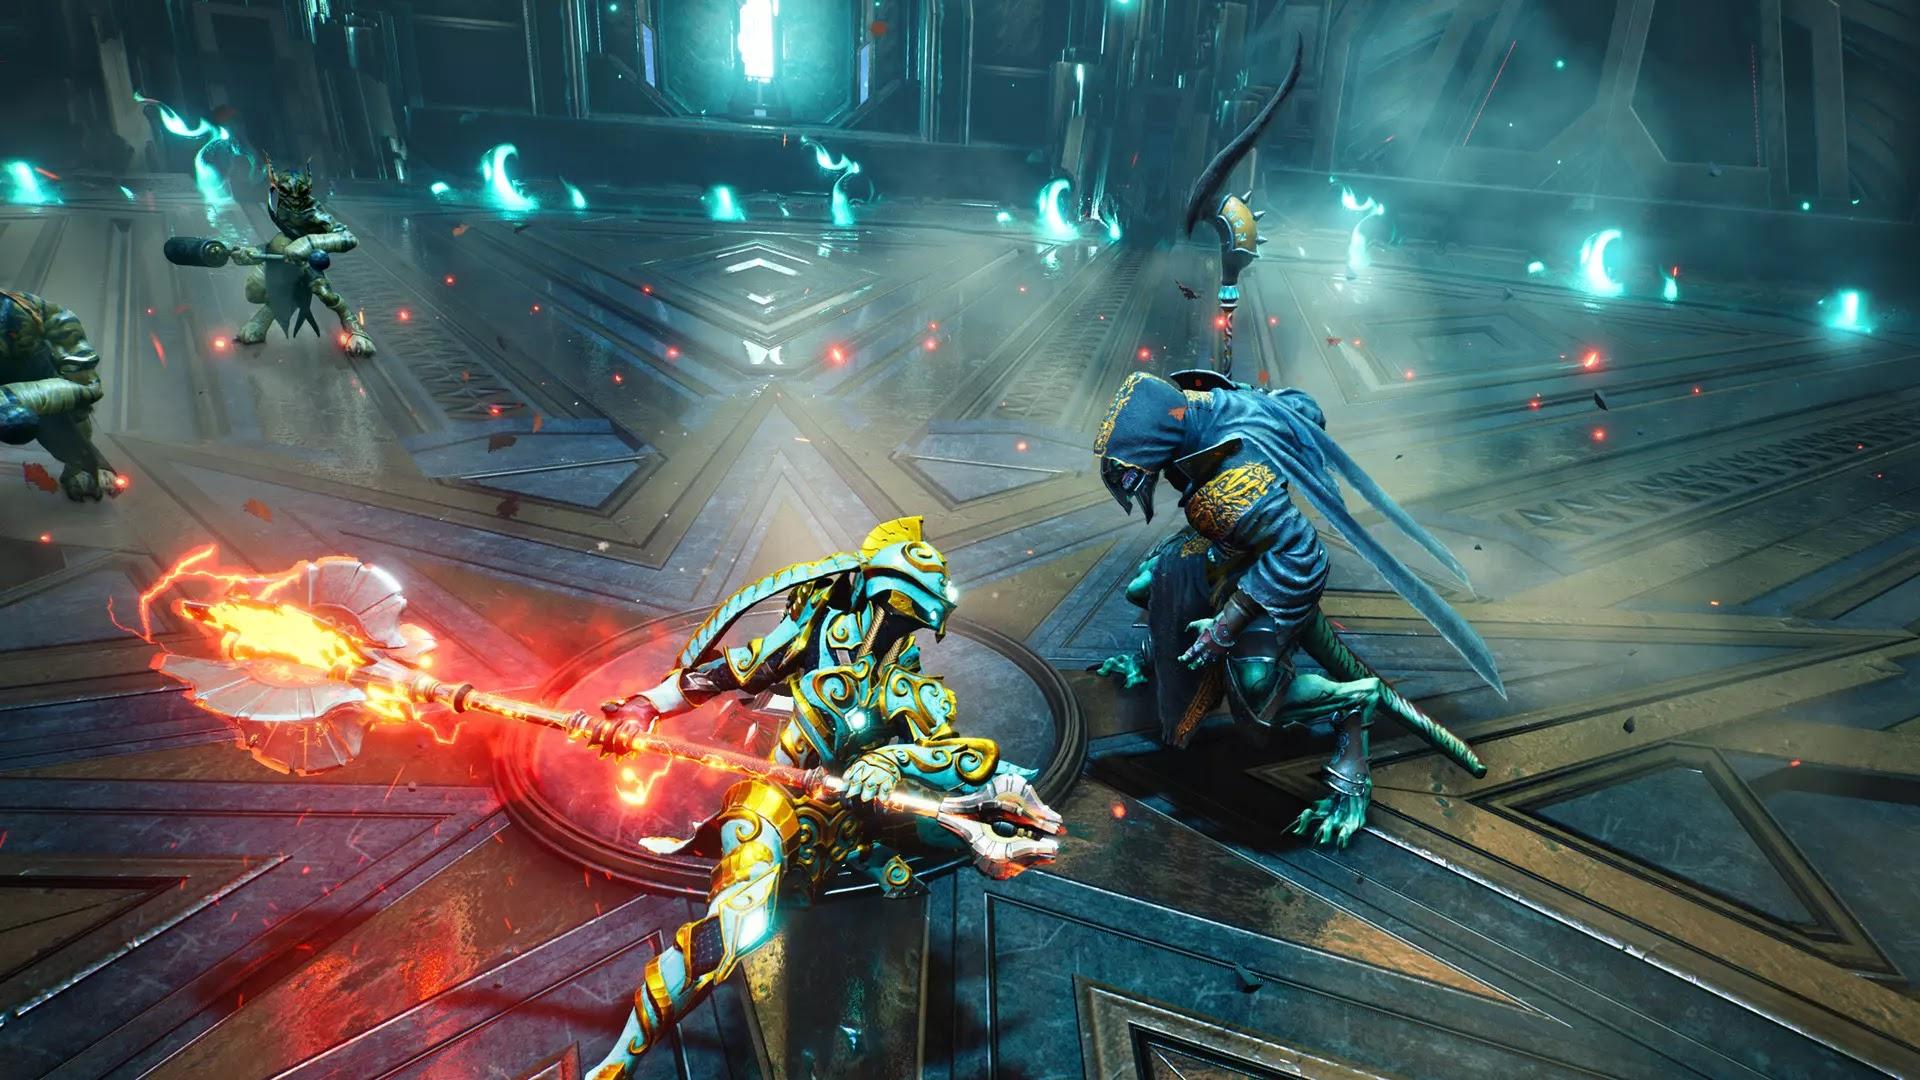 Godfall - Gearbox E3 2021 Showcase